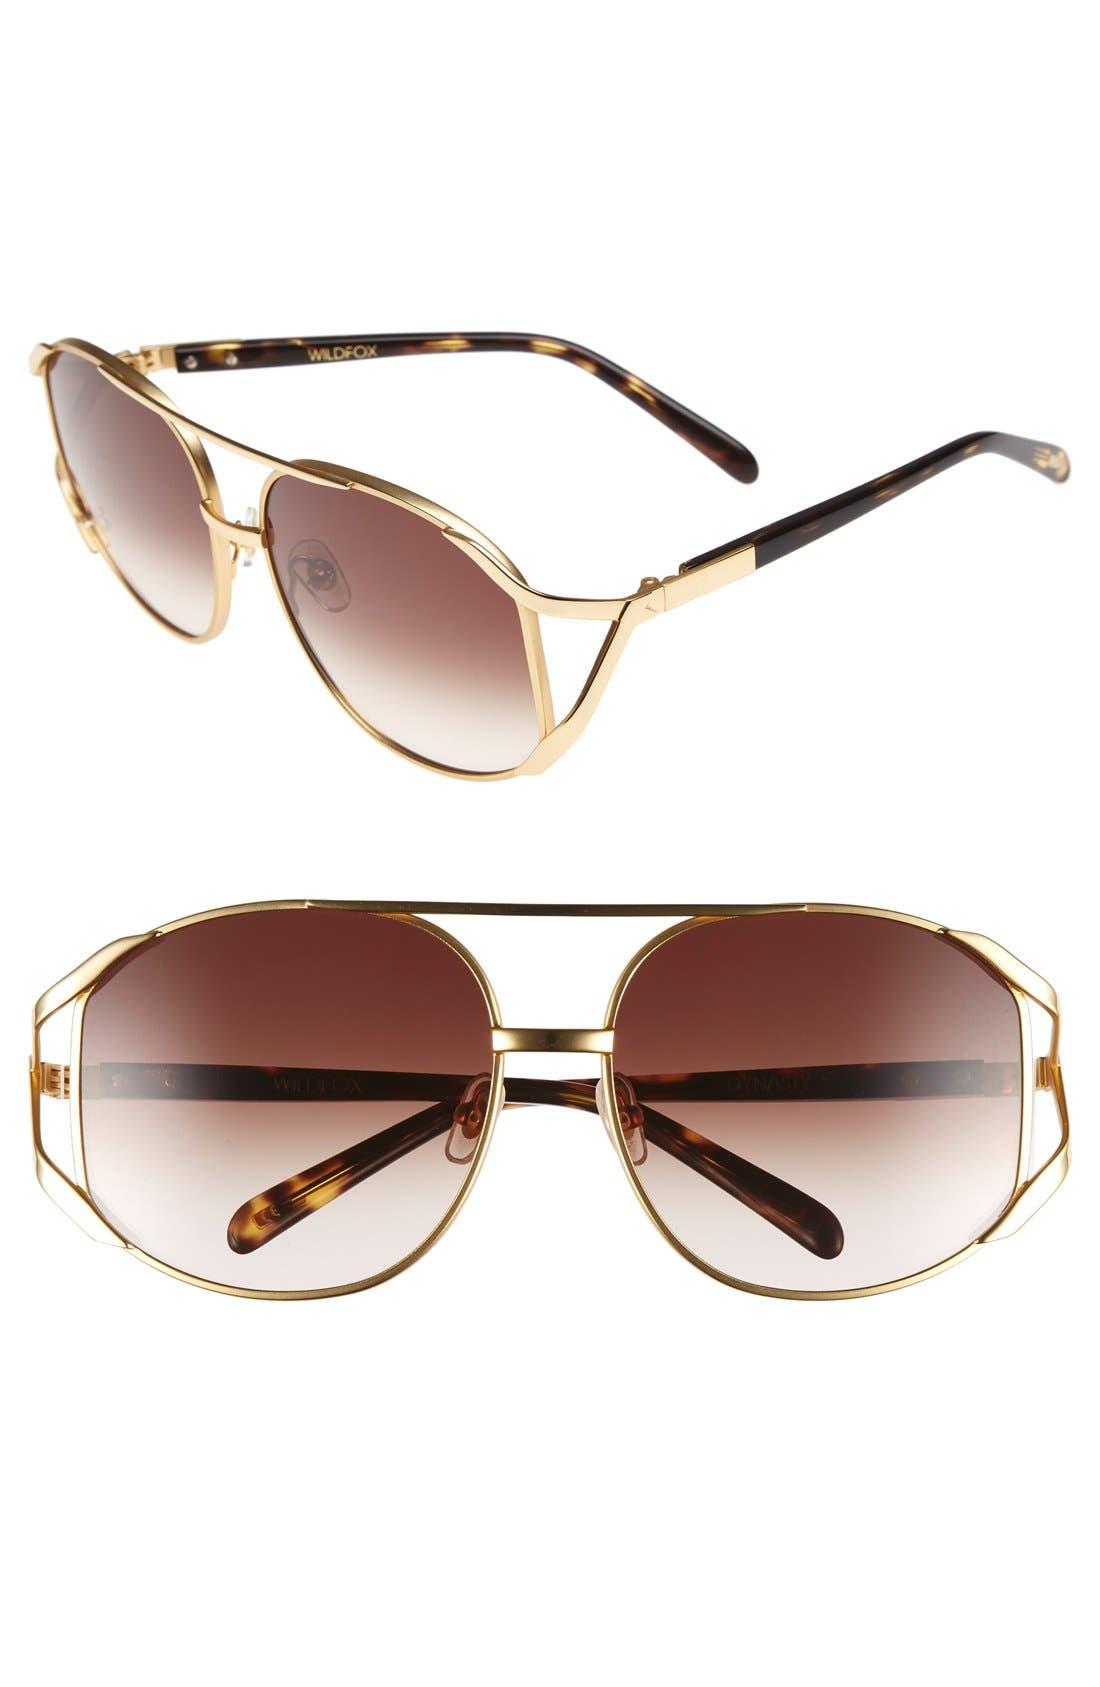 WILDFOX Dynasty 59mm Retro Sunglasses